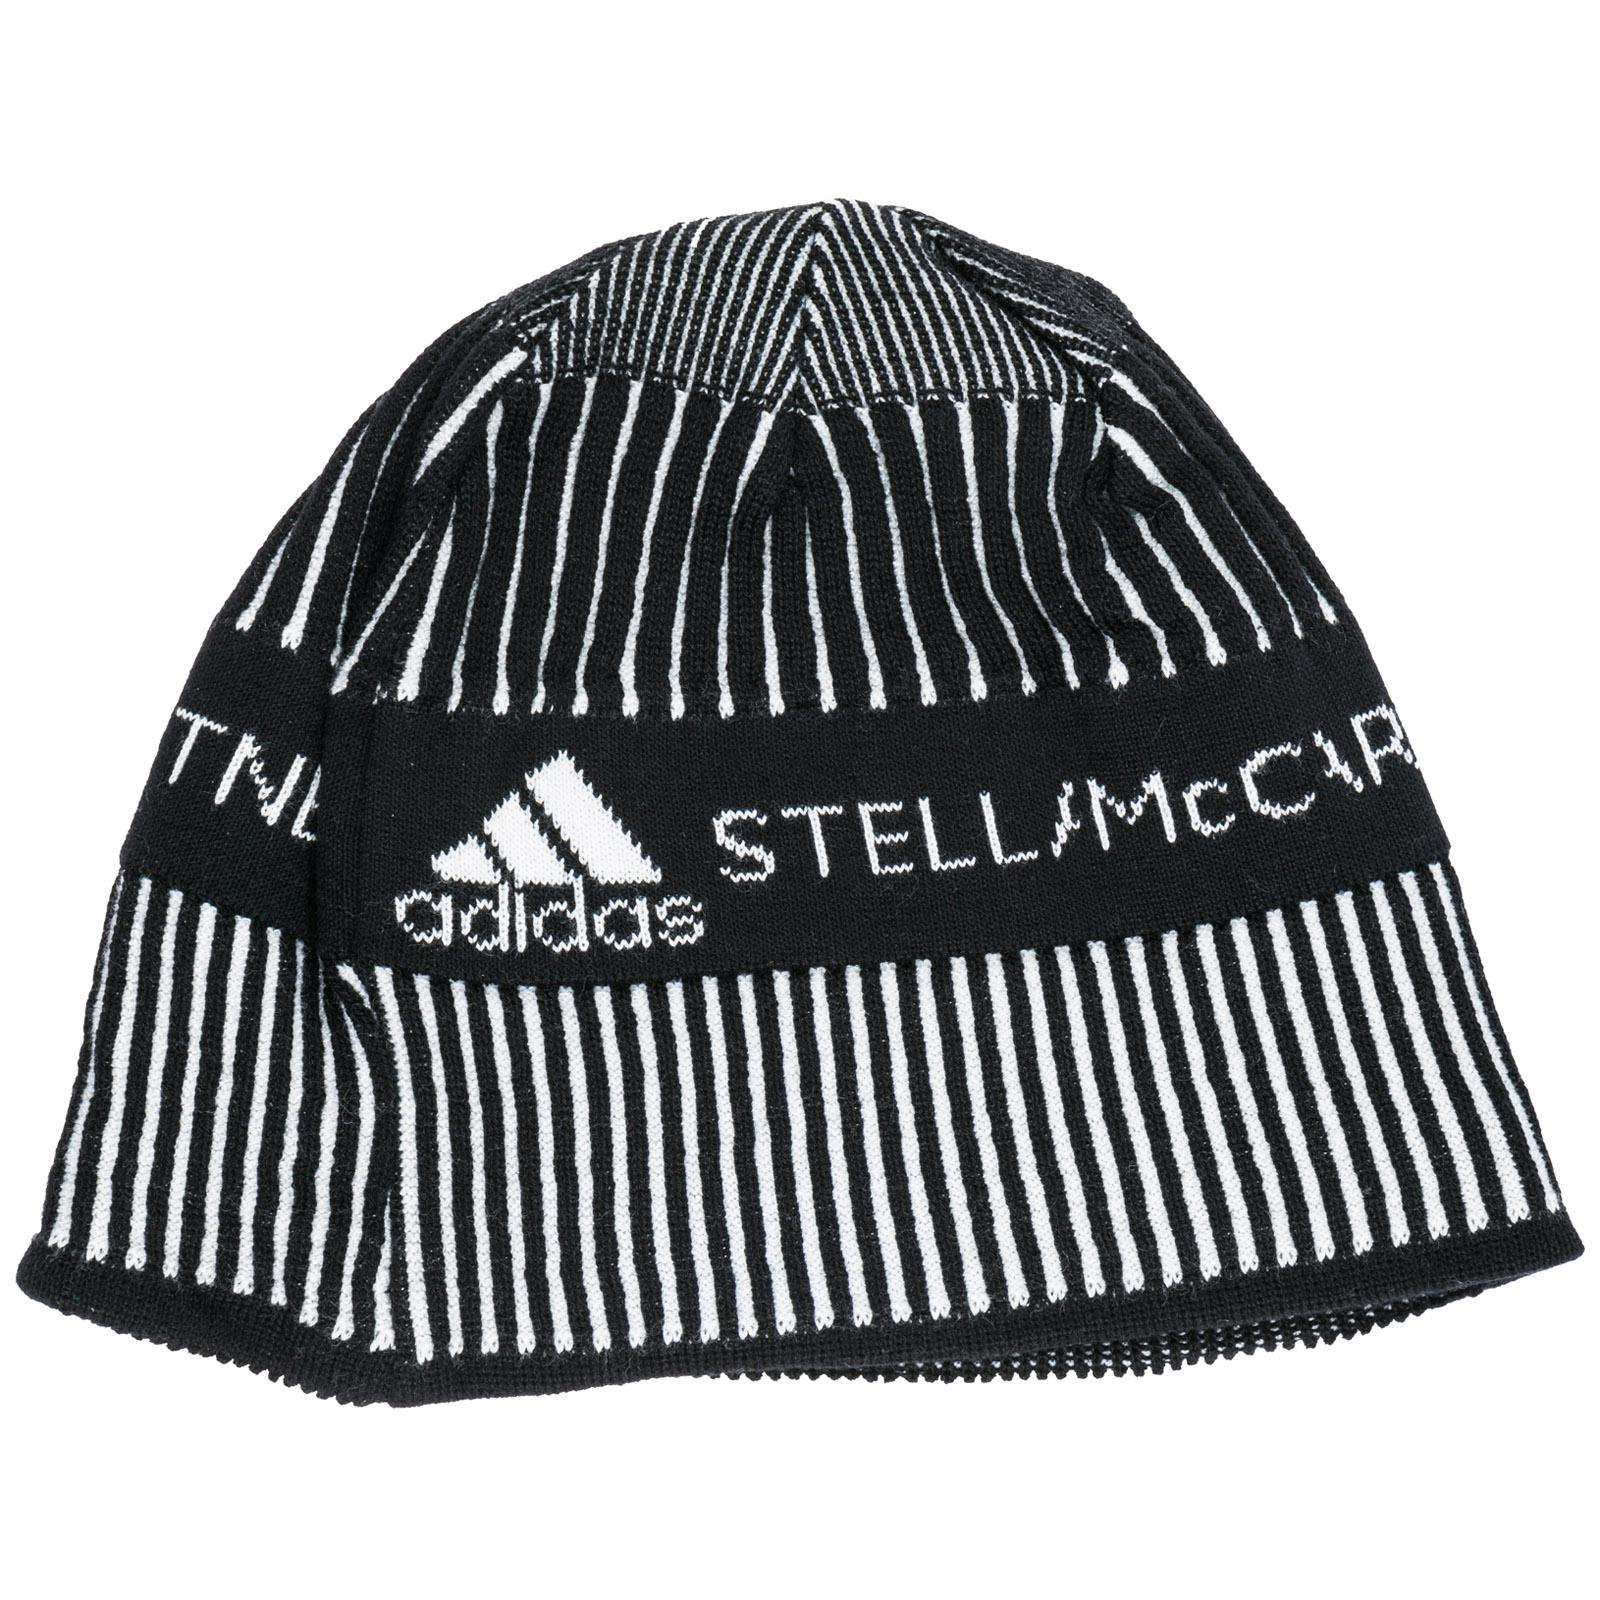 d1e4a1493539a Adidas By Stella McCartney - Black Beanie Hat - Lyst. View fullscreen